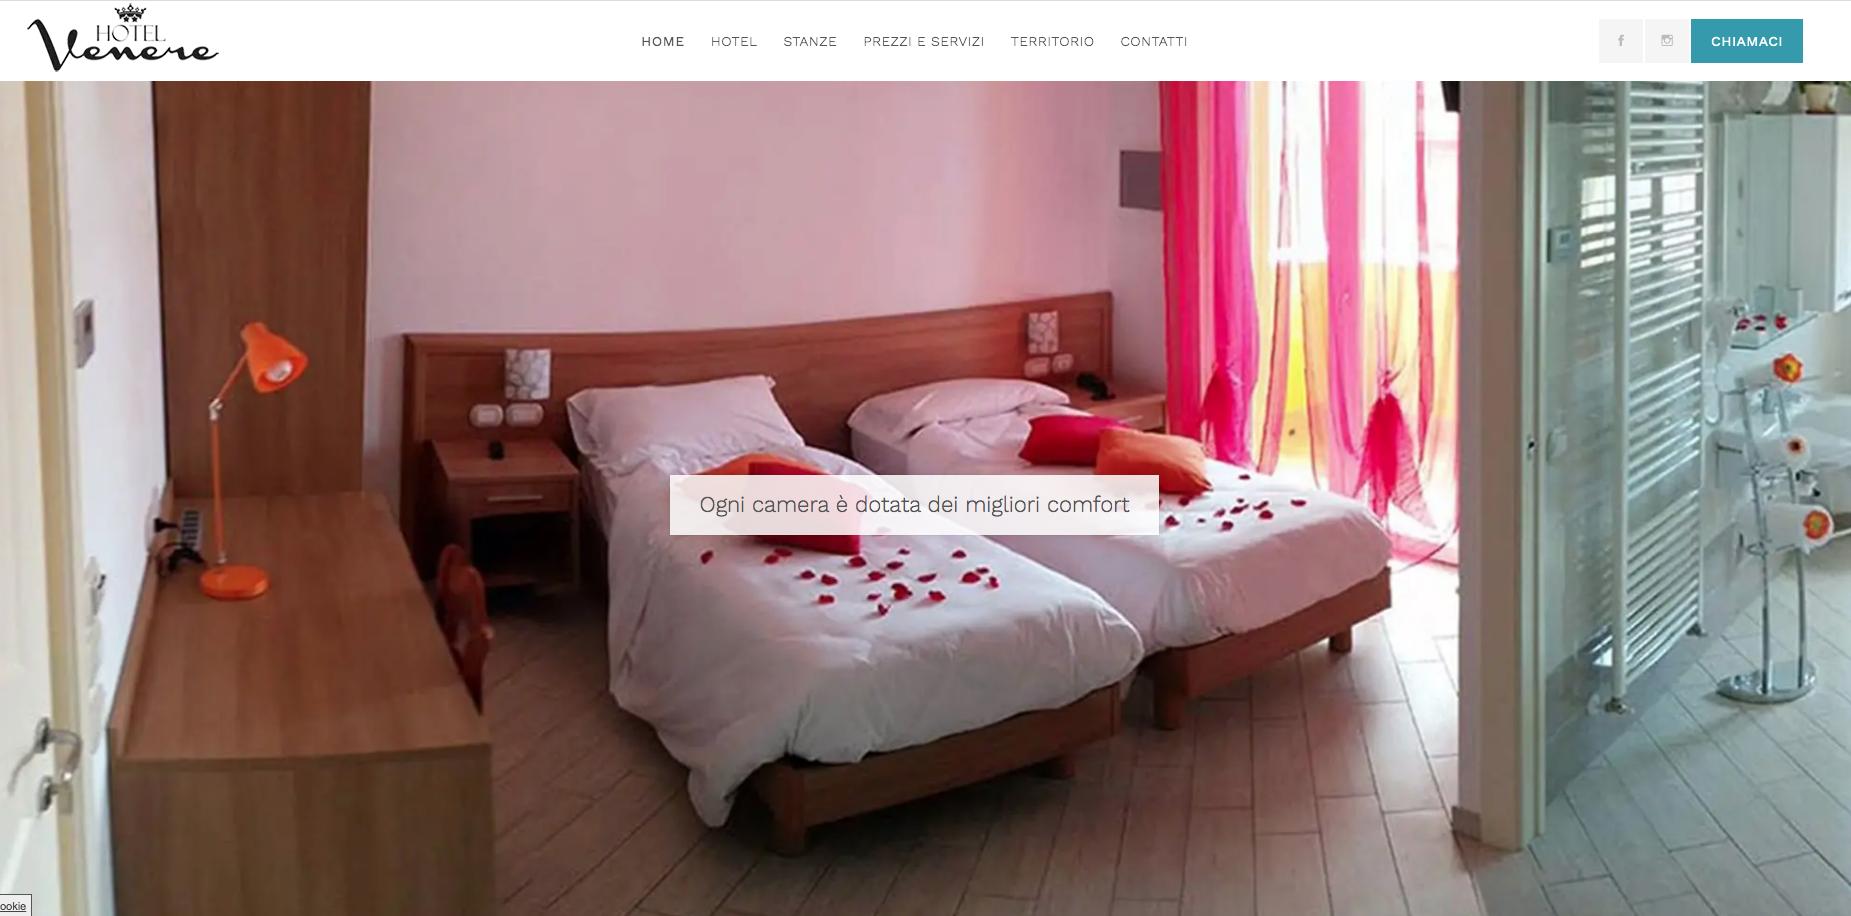 Grafica per l'Hotel Venere di Negrar (VR)